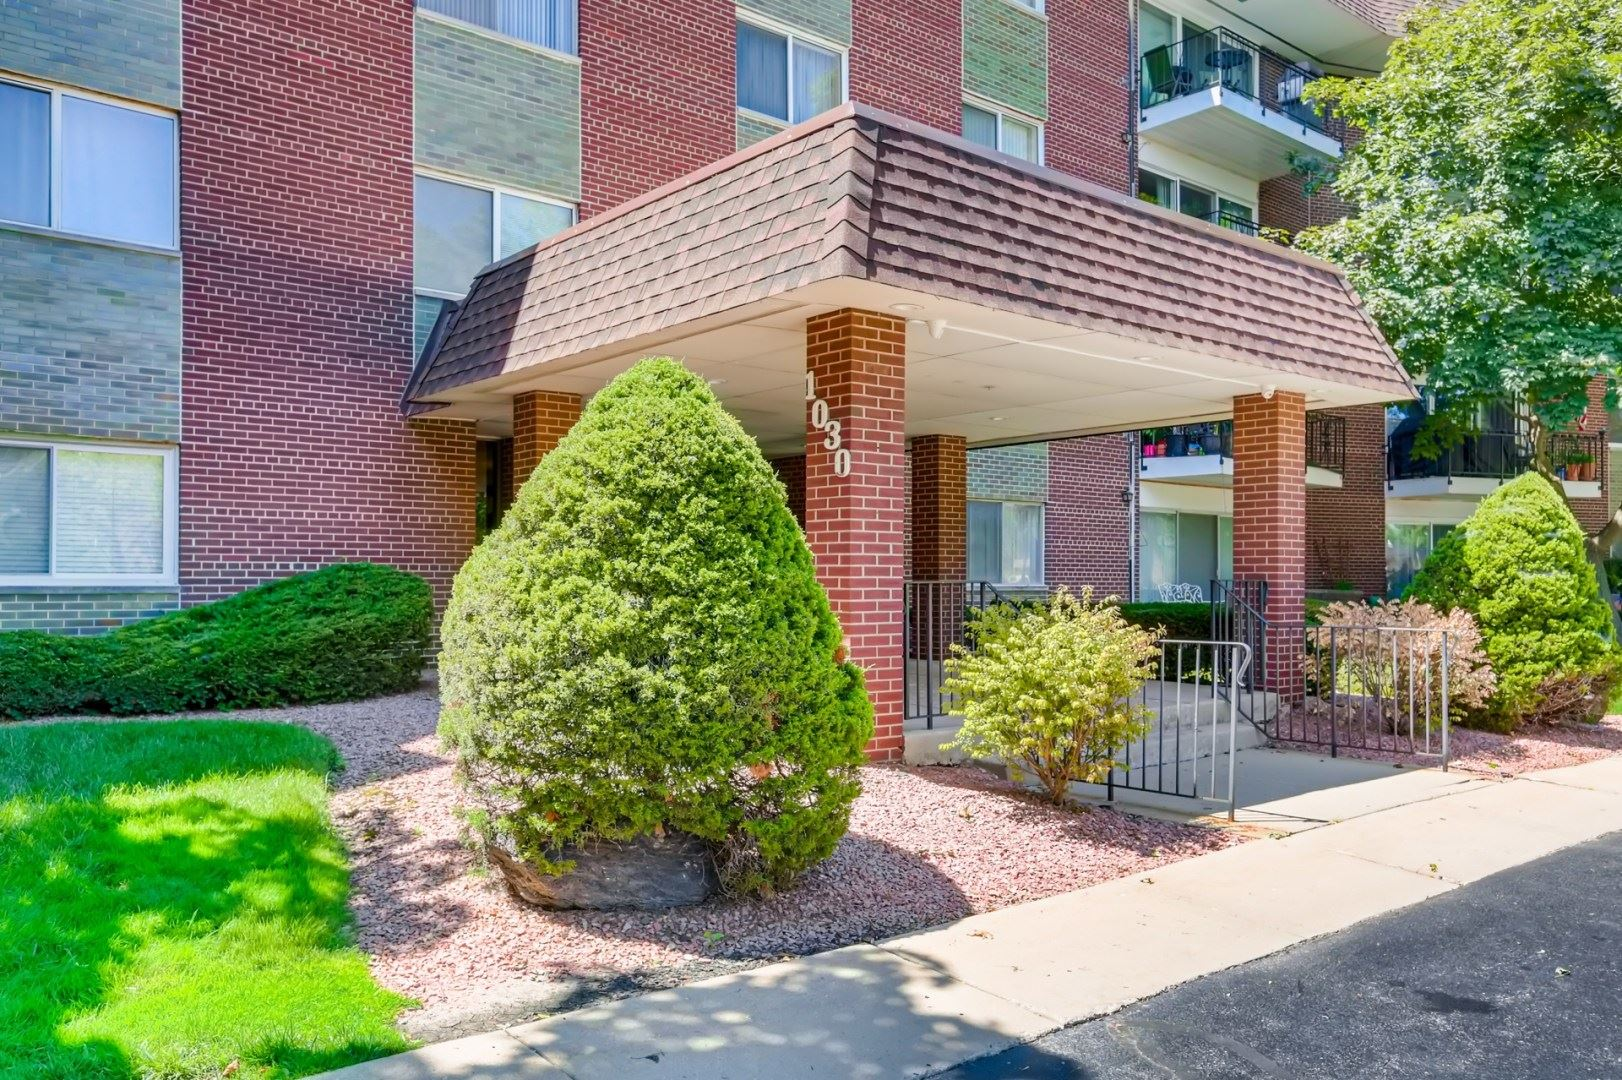 1030 S FERNANDEZ Avenue #1R, Arlington Heights, IL 60005 - #: 10799187